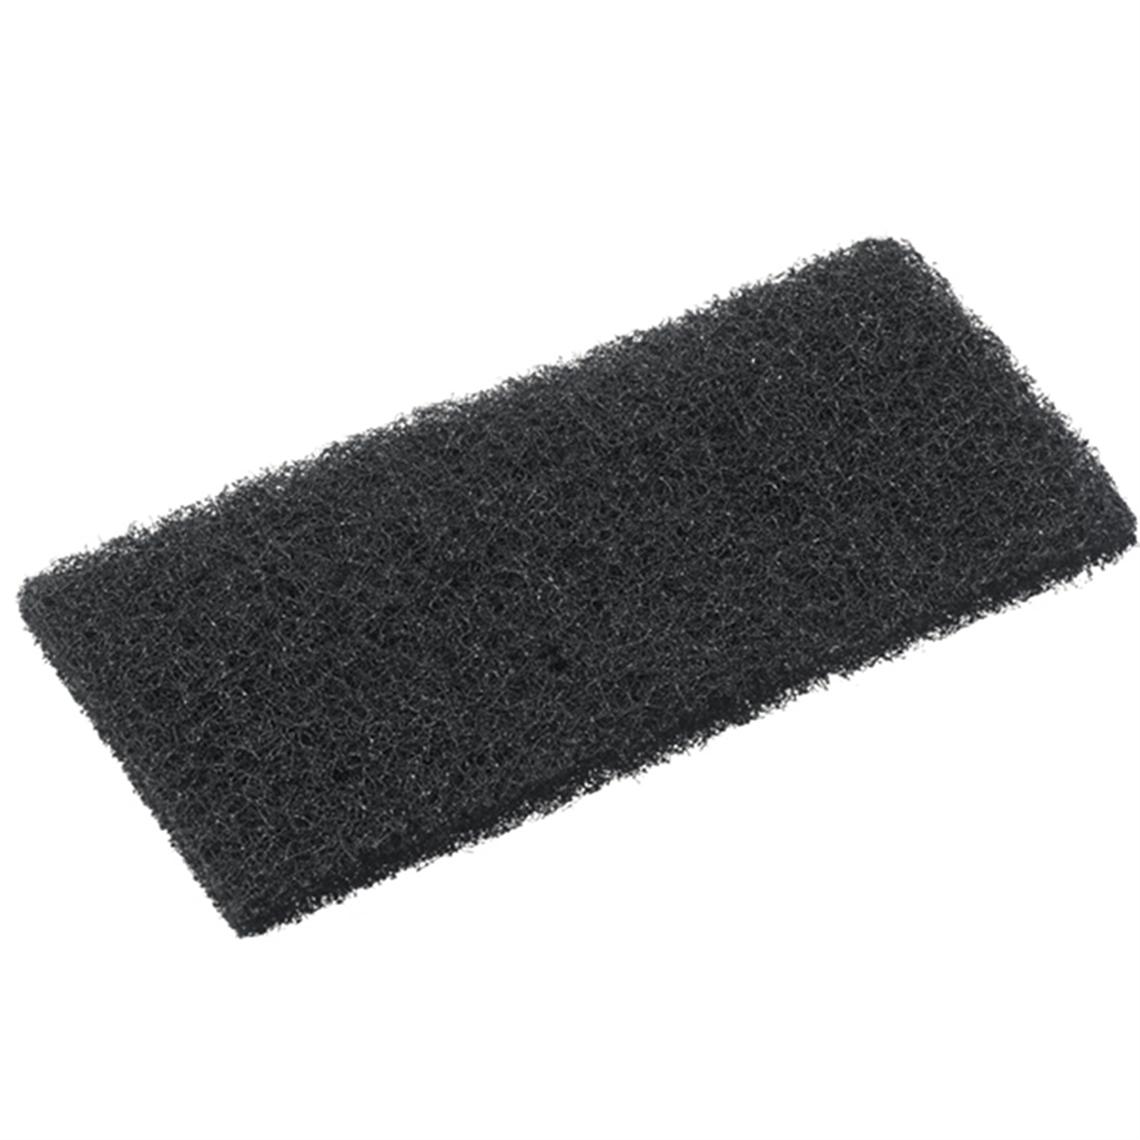 Eager Beaver Pad - Black